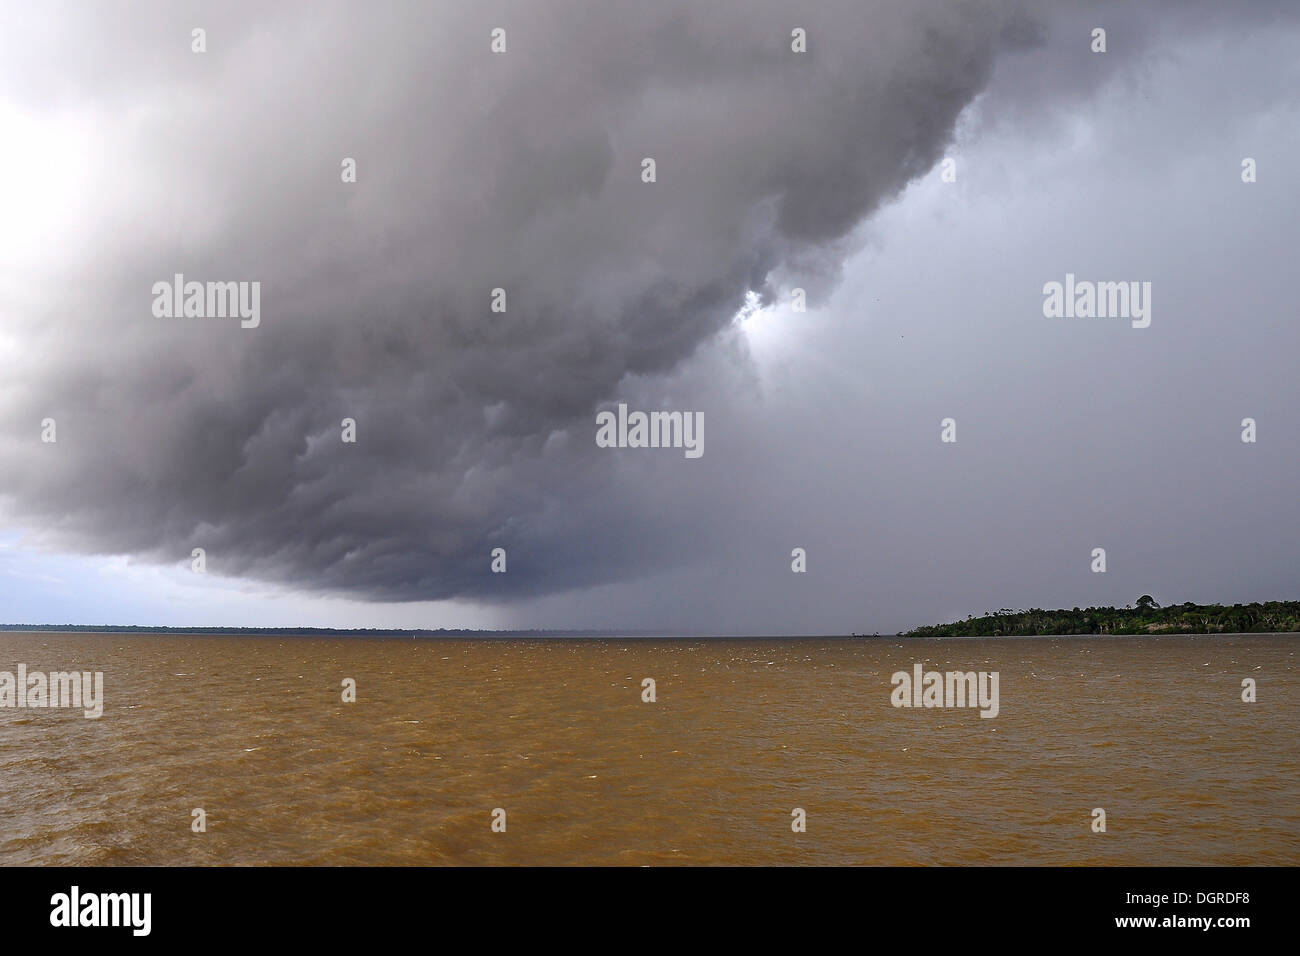 Menacing cloud front announcing a tropical storm, the Amazon between Manaus and Santarem, Amazonas province, Brazil - Stock Image